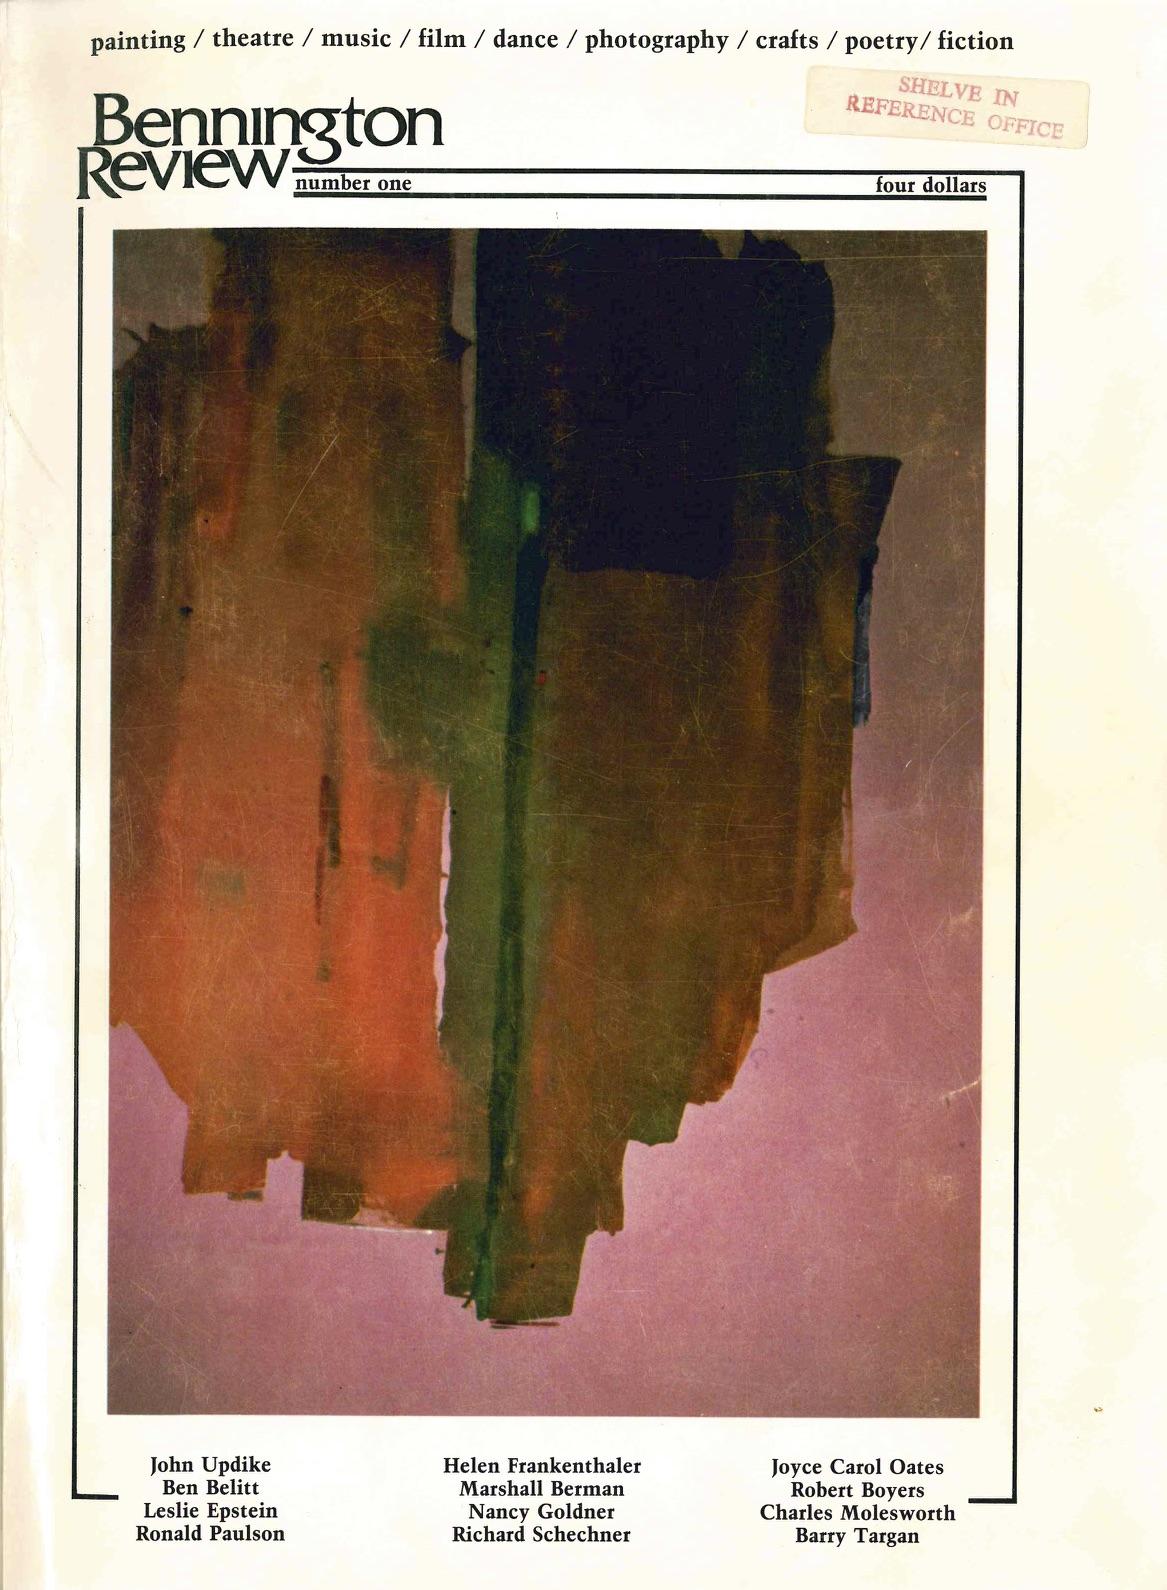 April 1978